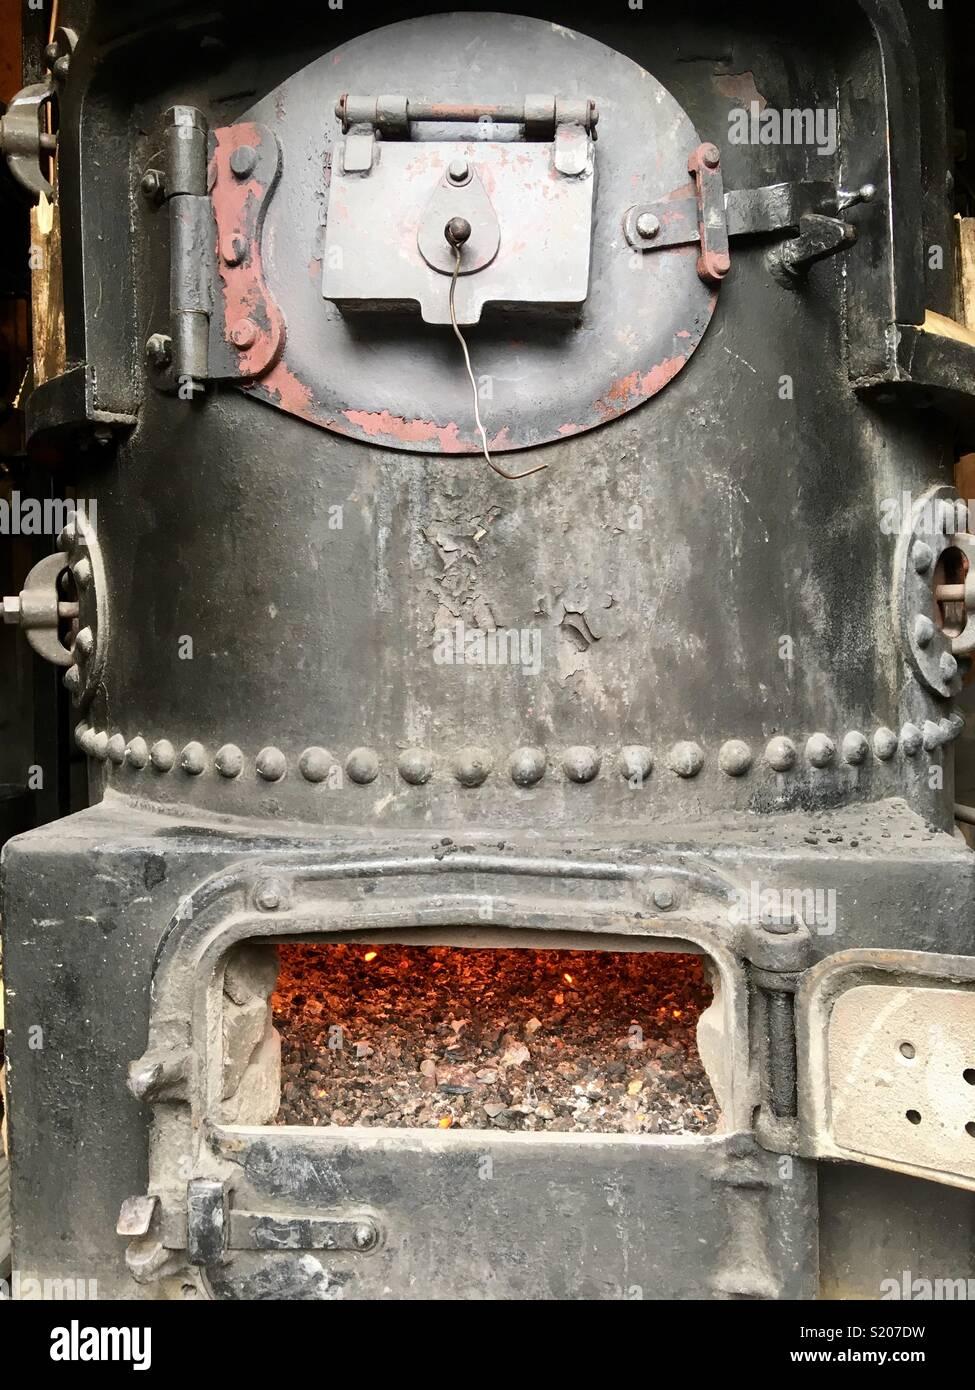 Old boiler with furnace door open & Old boiler with furnace door open Stock Photo: 311021813 - Alamy